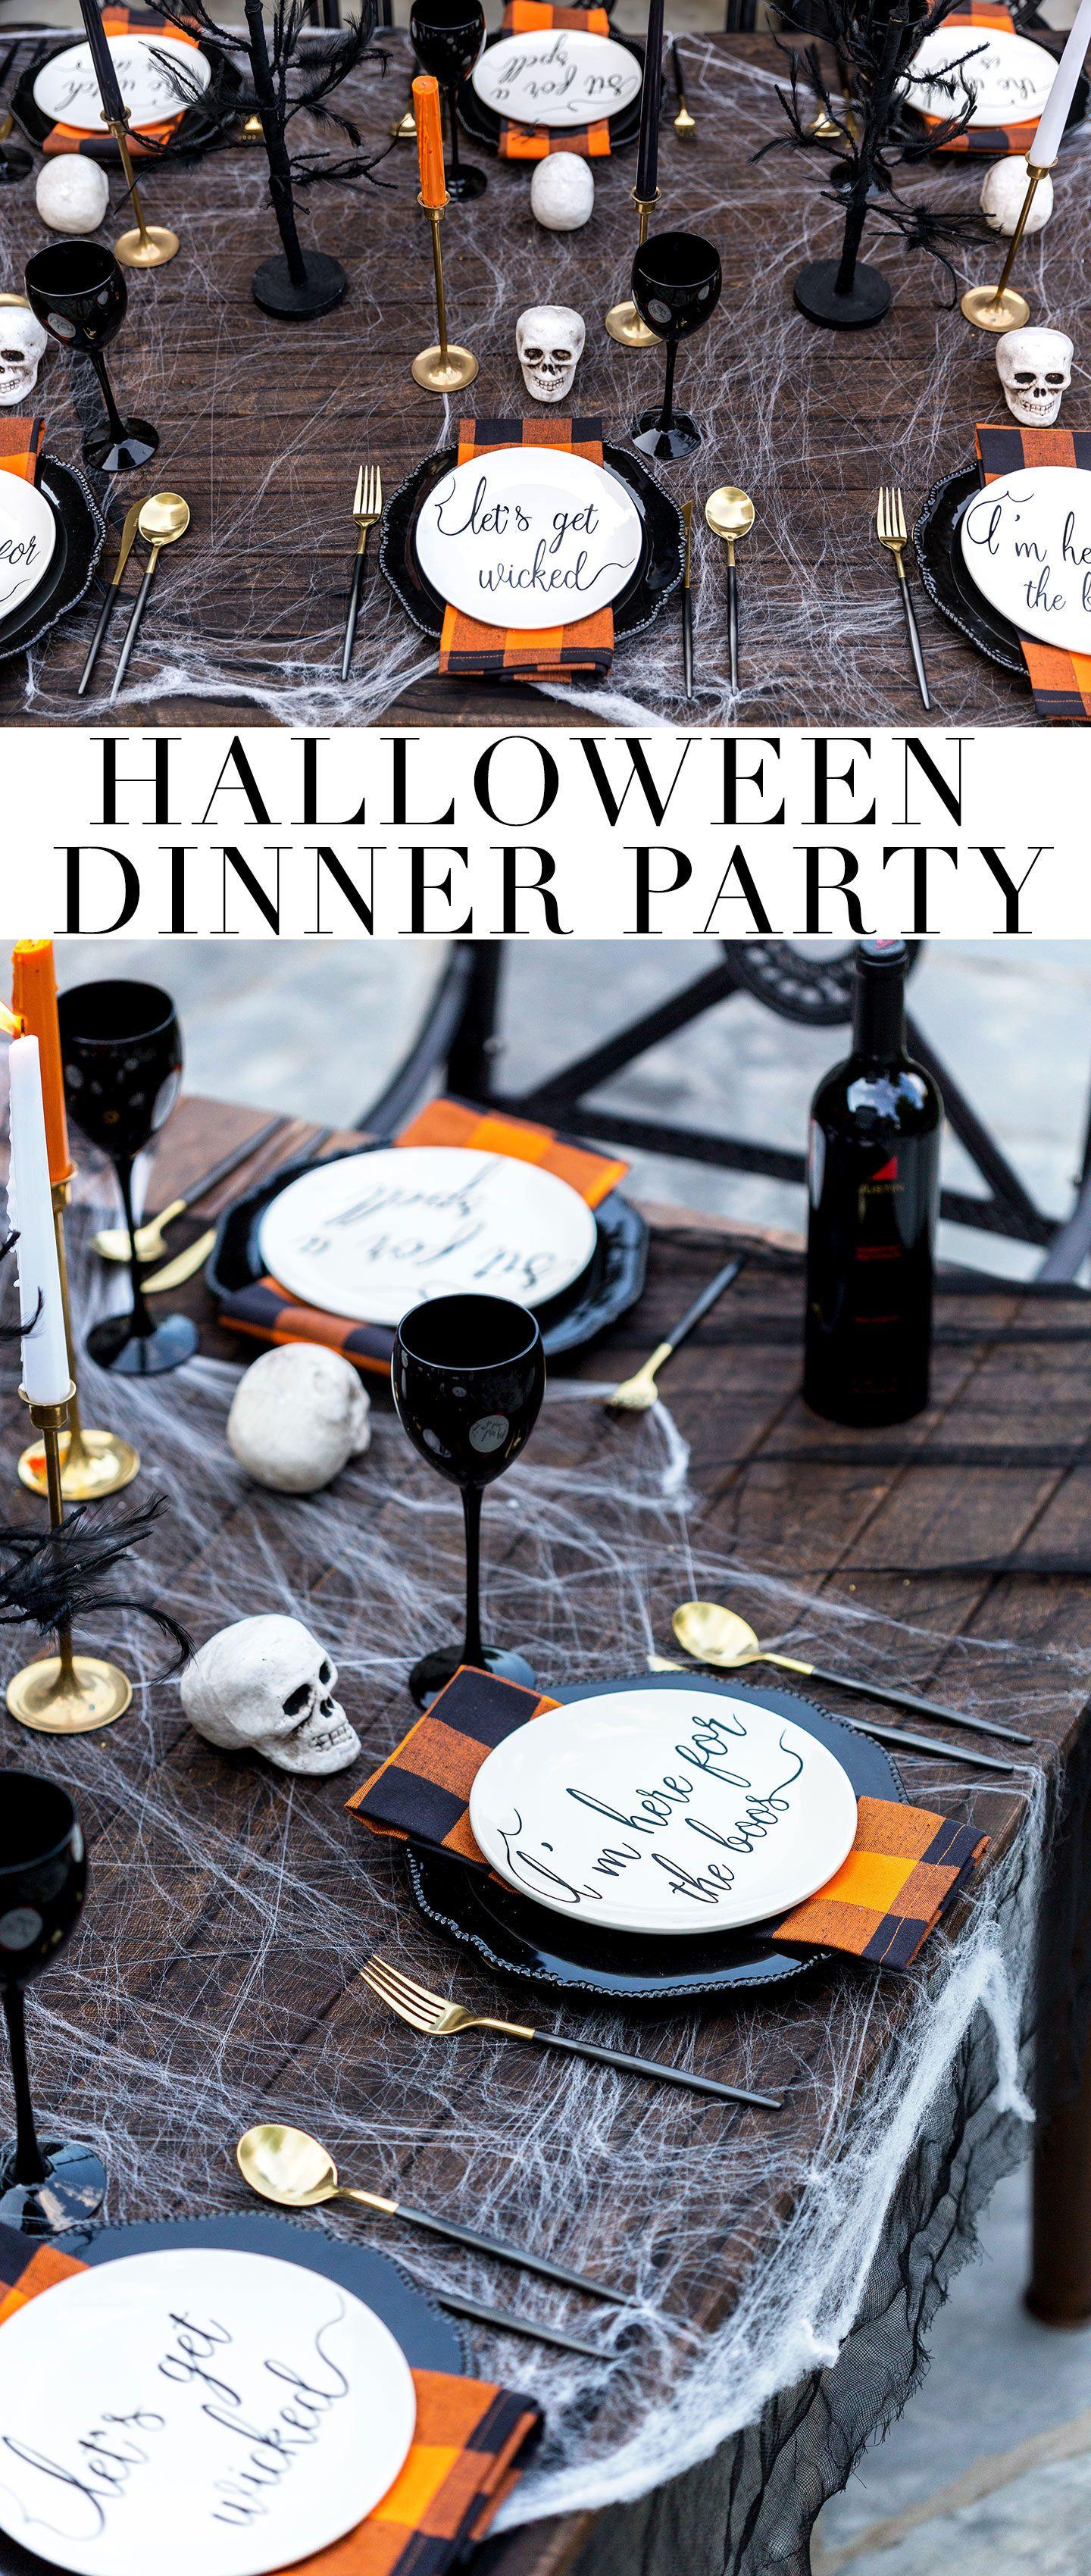 Halloween Dinner Party & Menu Ideas Halloween party